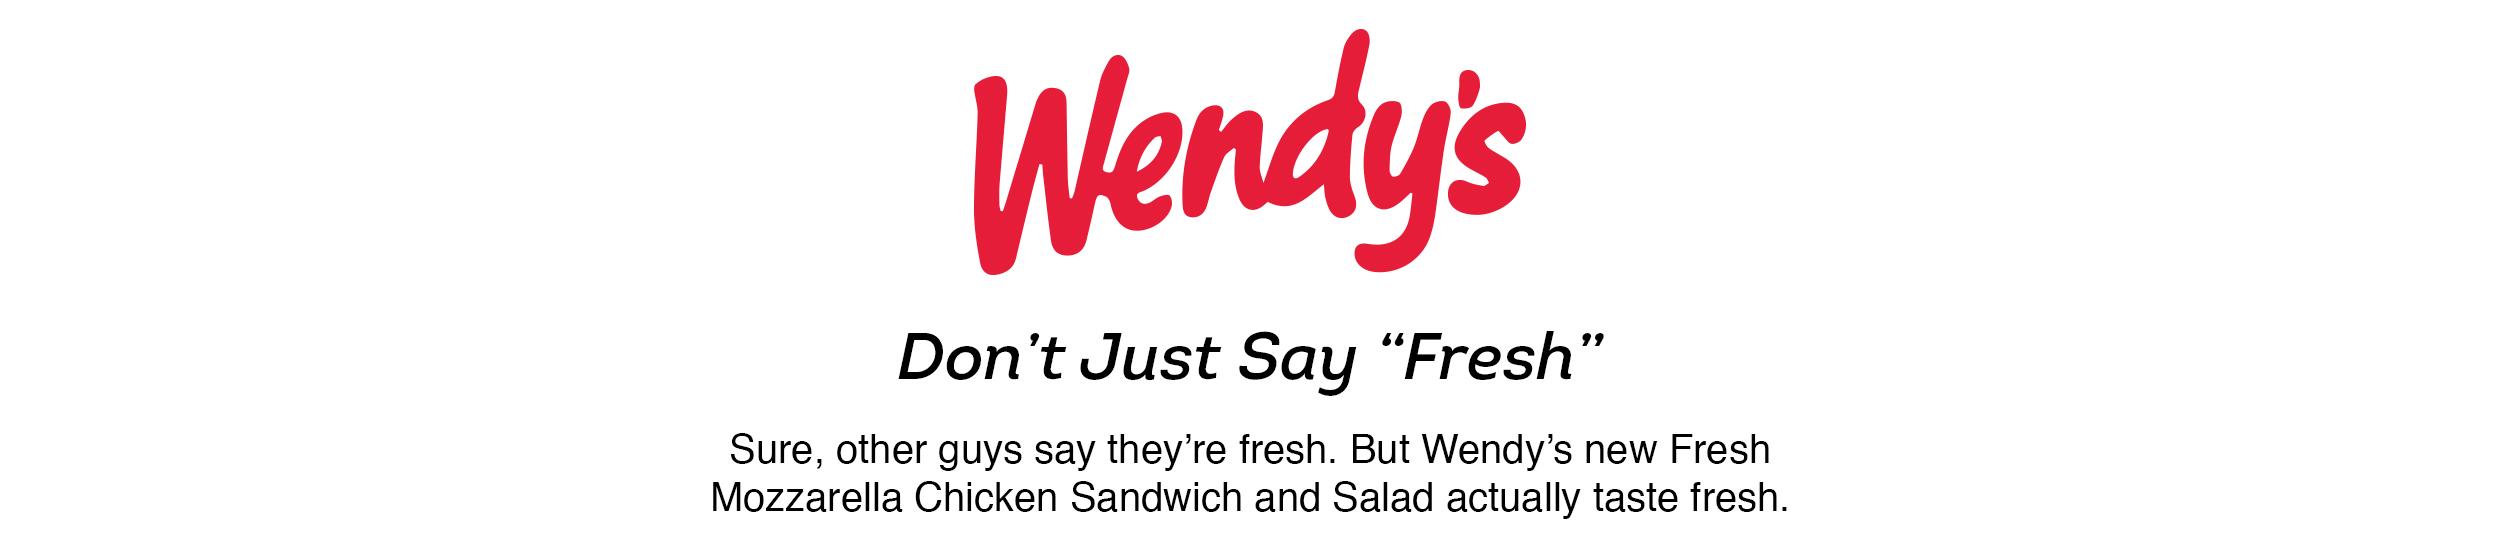 wendy's fresh